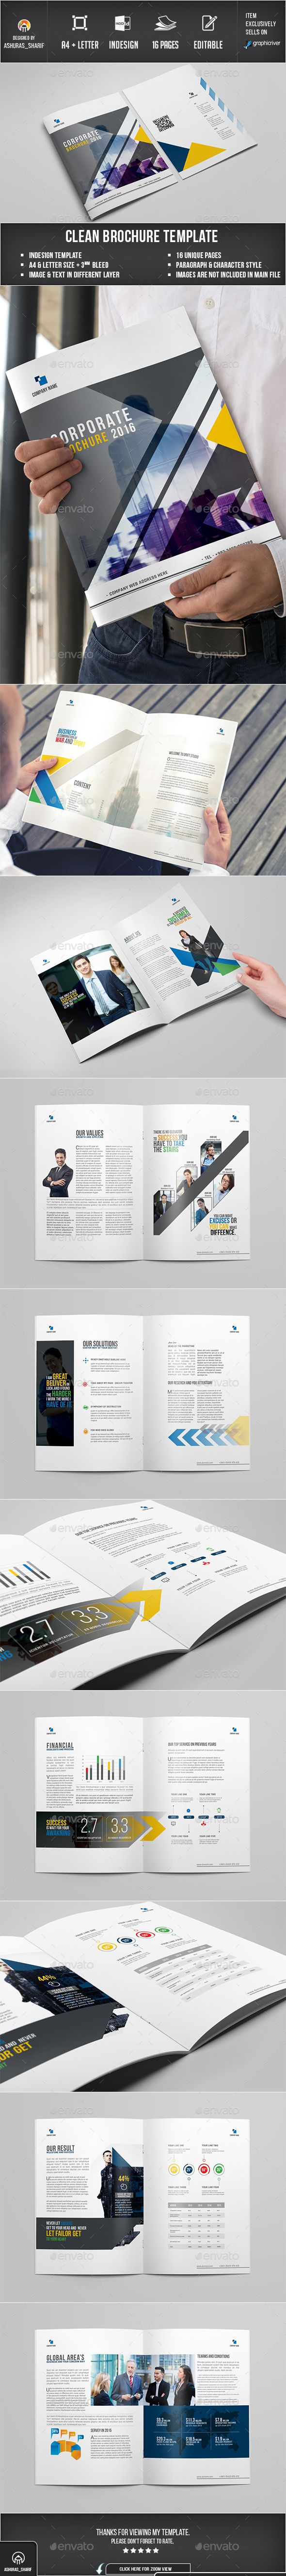 Business Brochure Template InDesign INDD #design Download: http://graphicriver.net/item/corporate-brochure-12/13789496?ref=ksioks